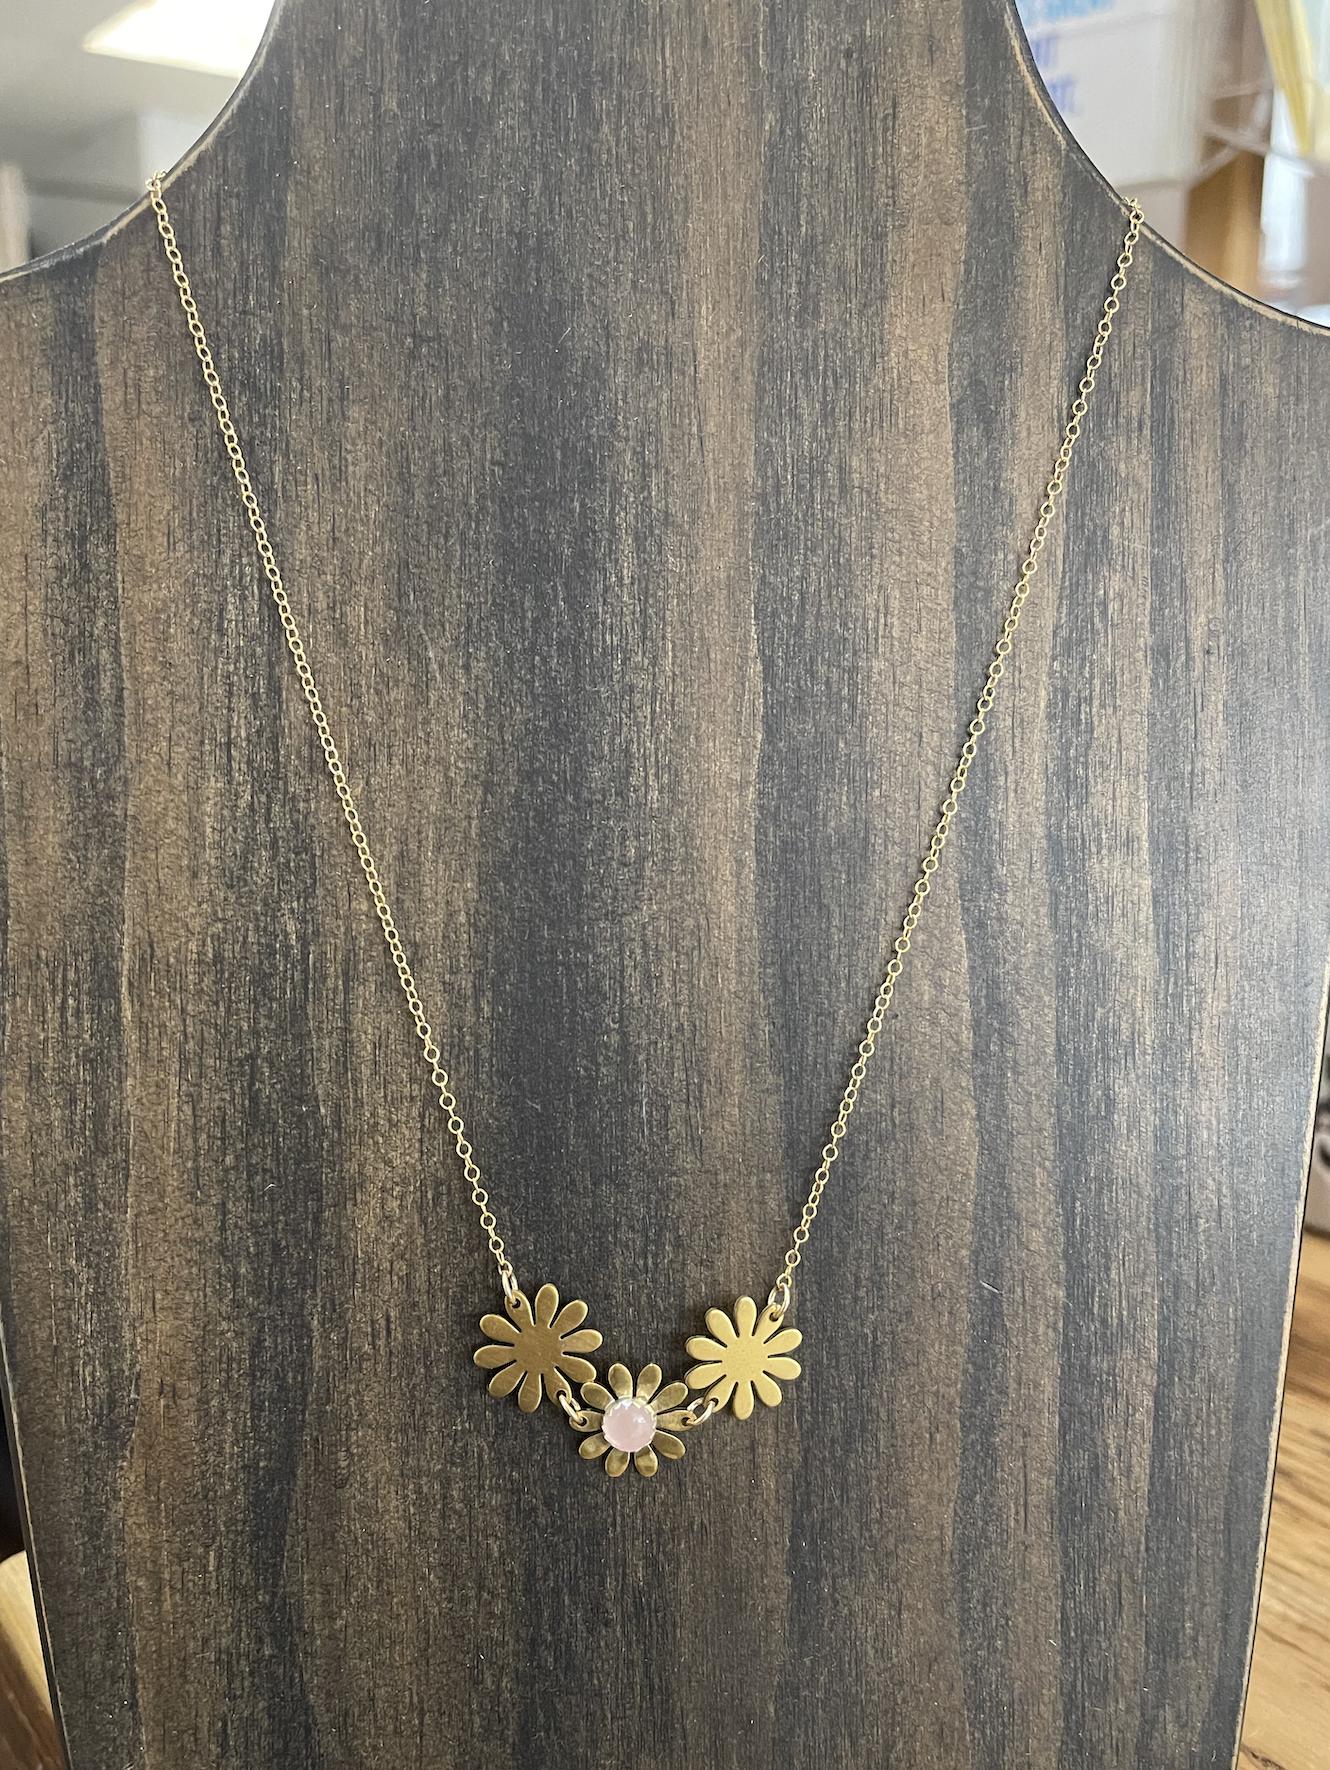 Metrix Jewelry Brigitte Necklace- Rose Quartz